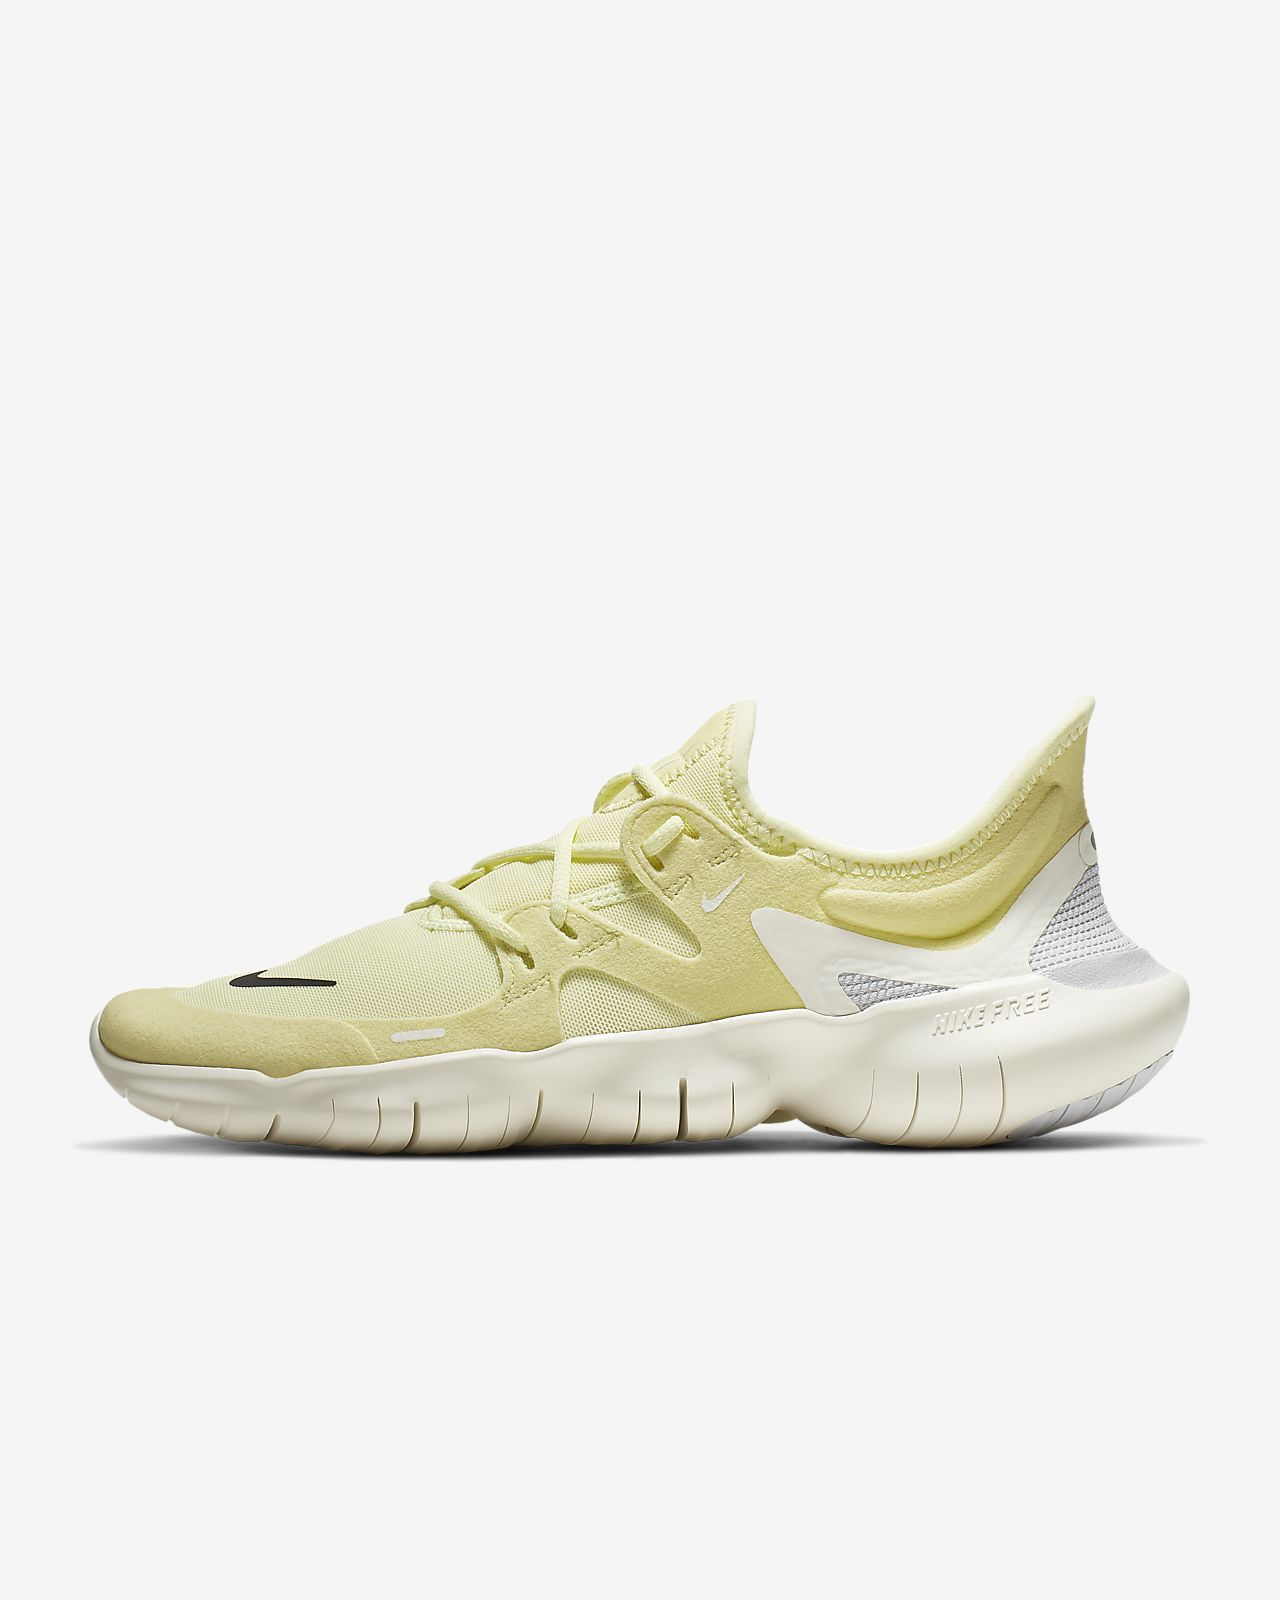 Nike Free RN 5.0 Damen Laufschuh schwarz